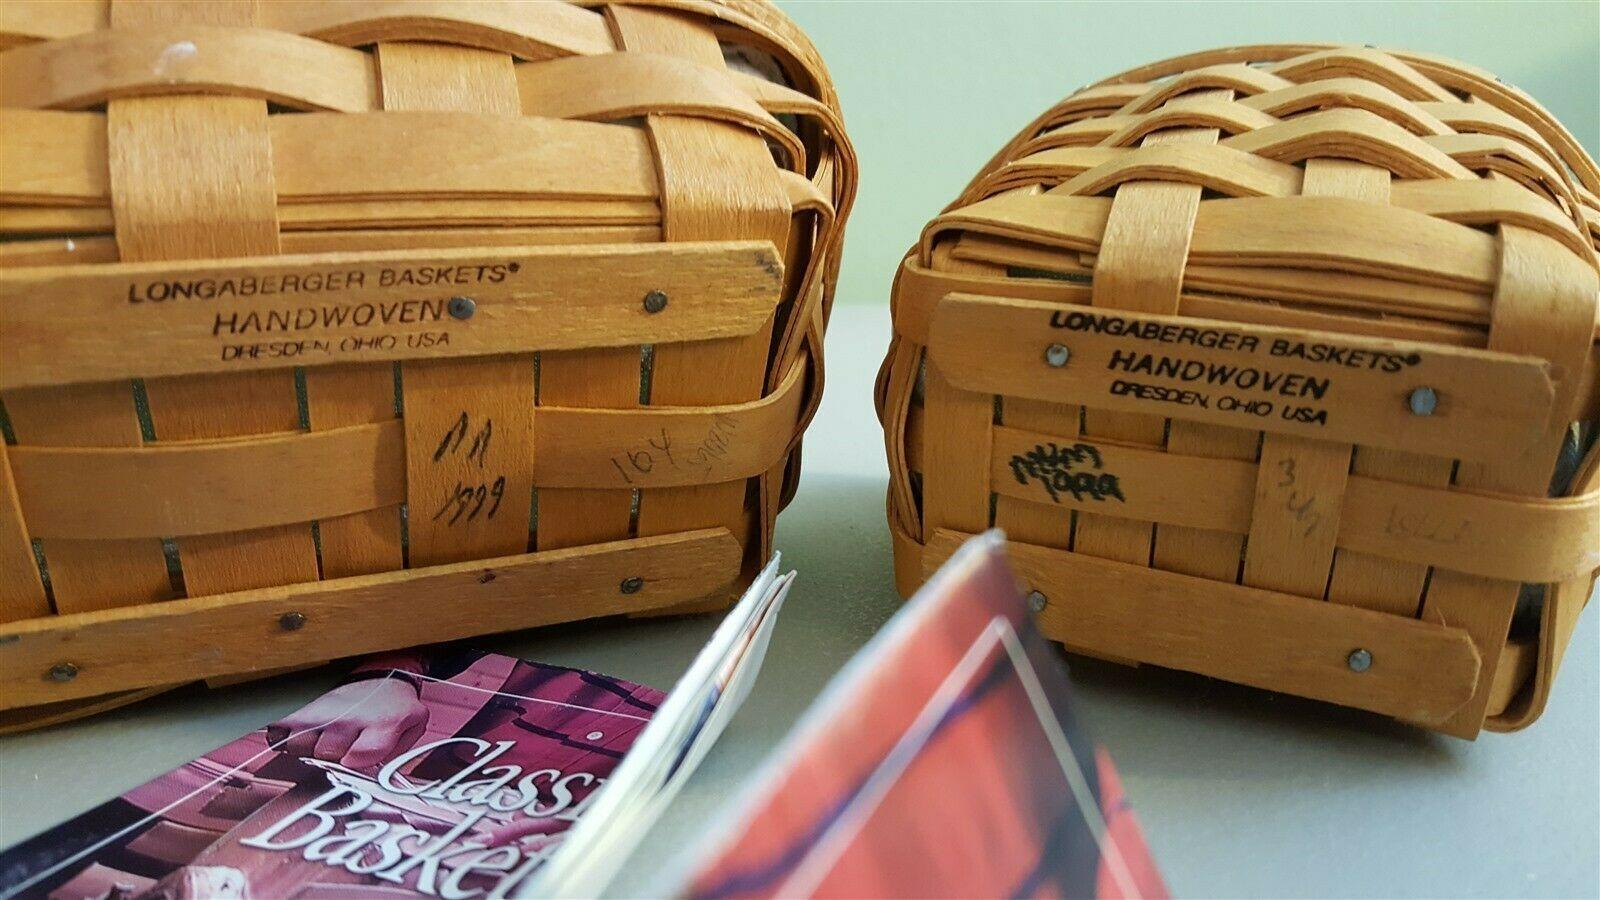 Longaberger 1999 OREGANO & PARSLEY BOOKING BASKET 2 Baskets Liners & Protectors